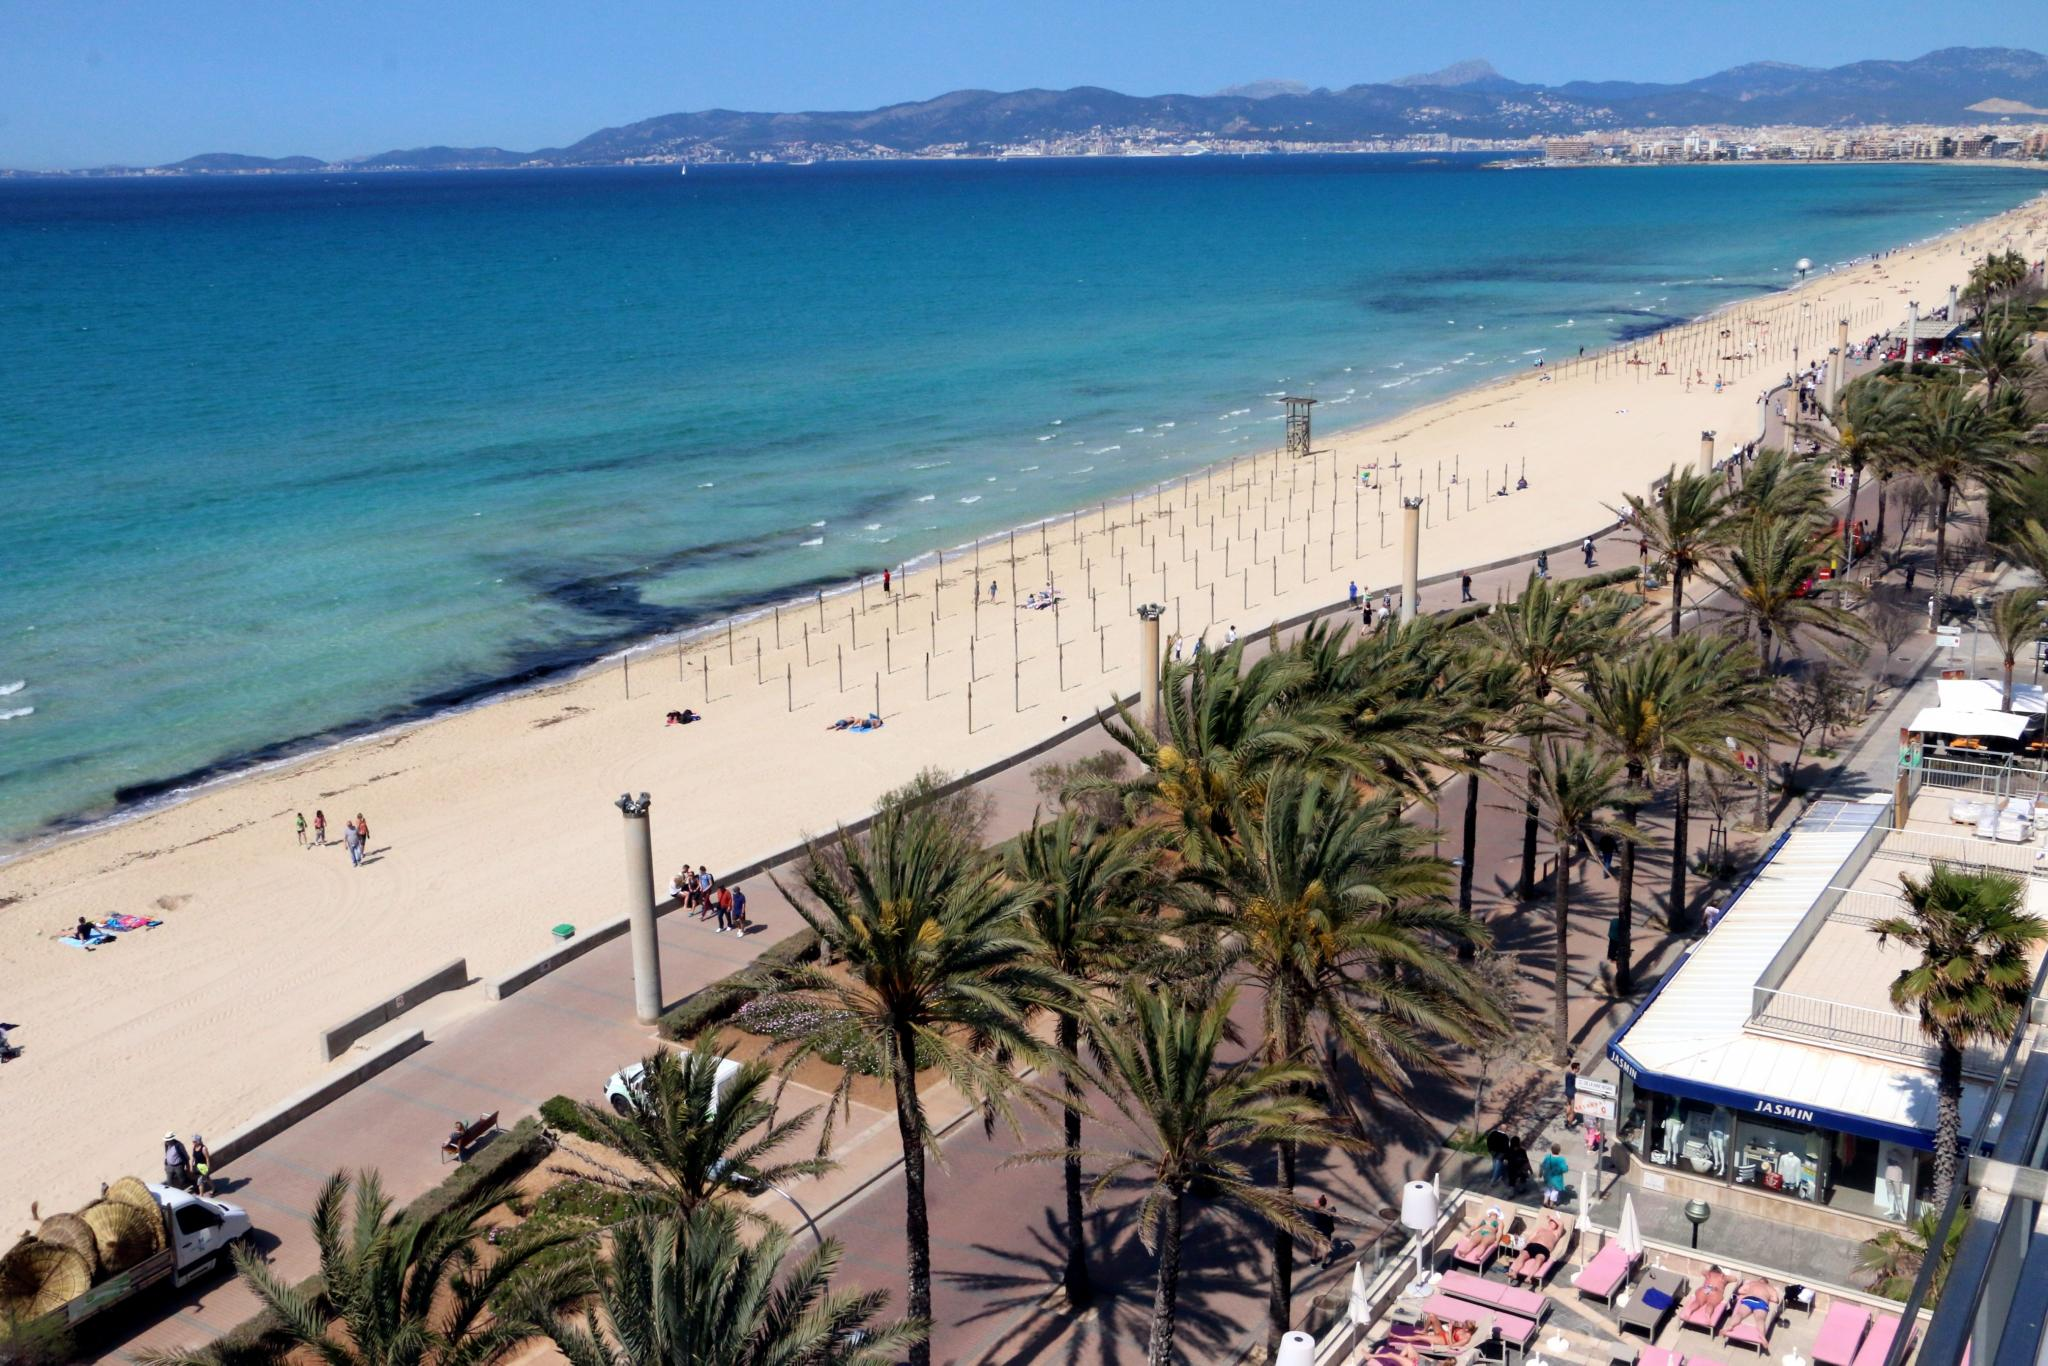 Plattform f r zivilisierte playa de palma macht druck for Design hotel mallorca strand